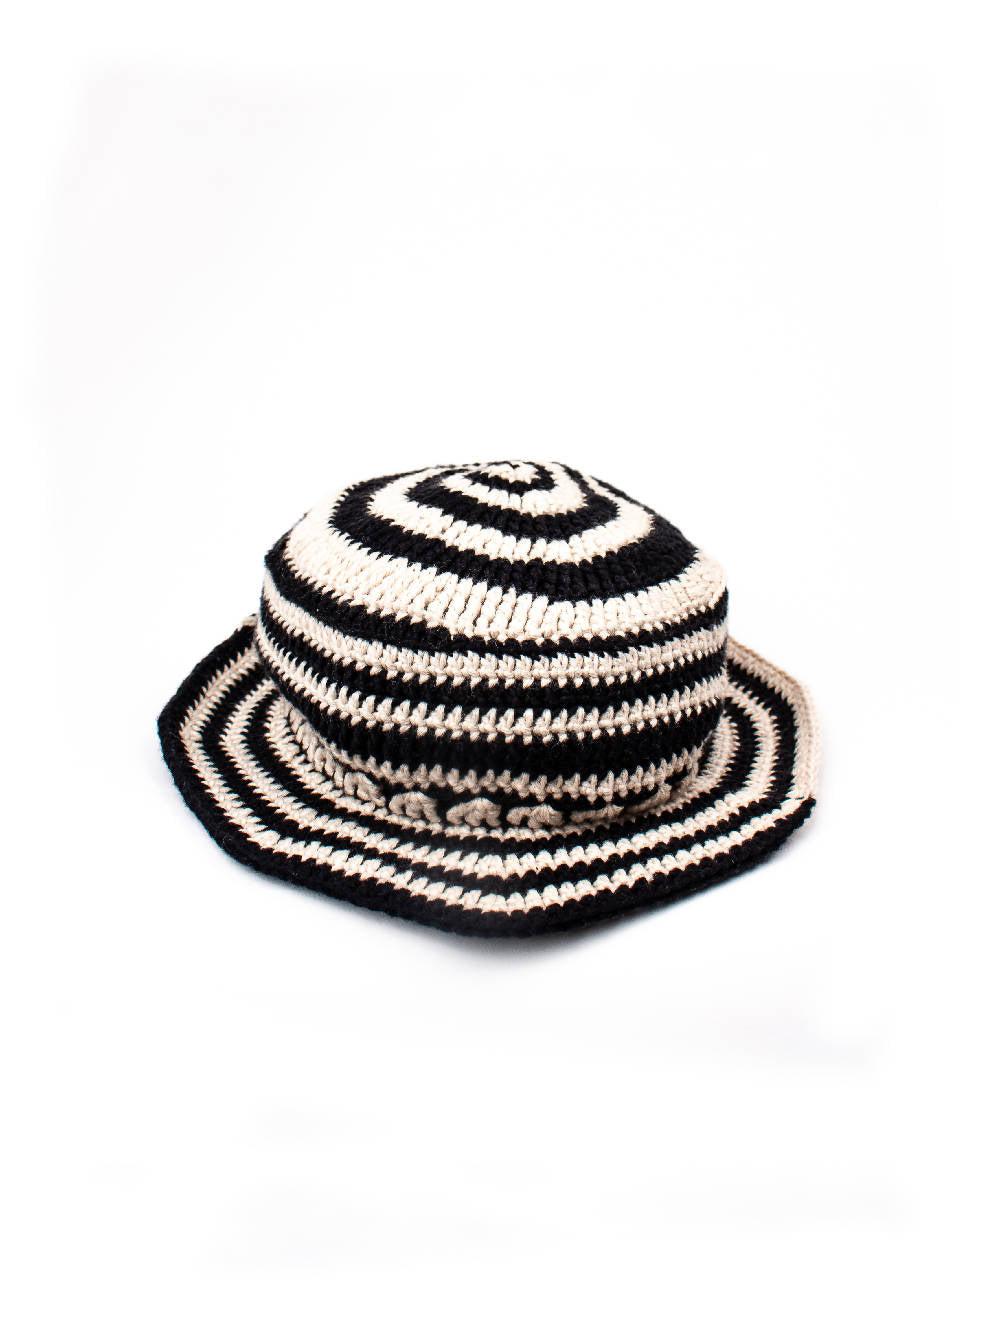 PAR CIELLE Black Pearl Swirly Sun Hat